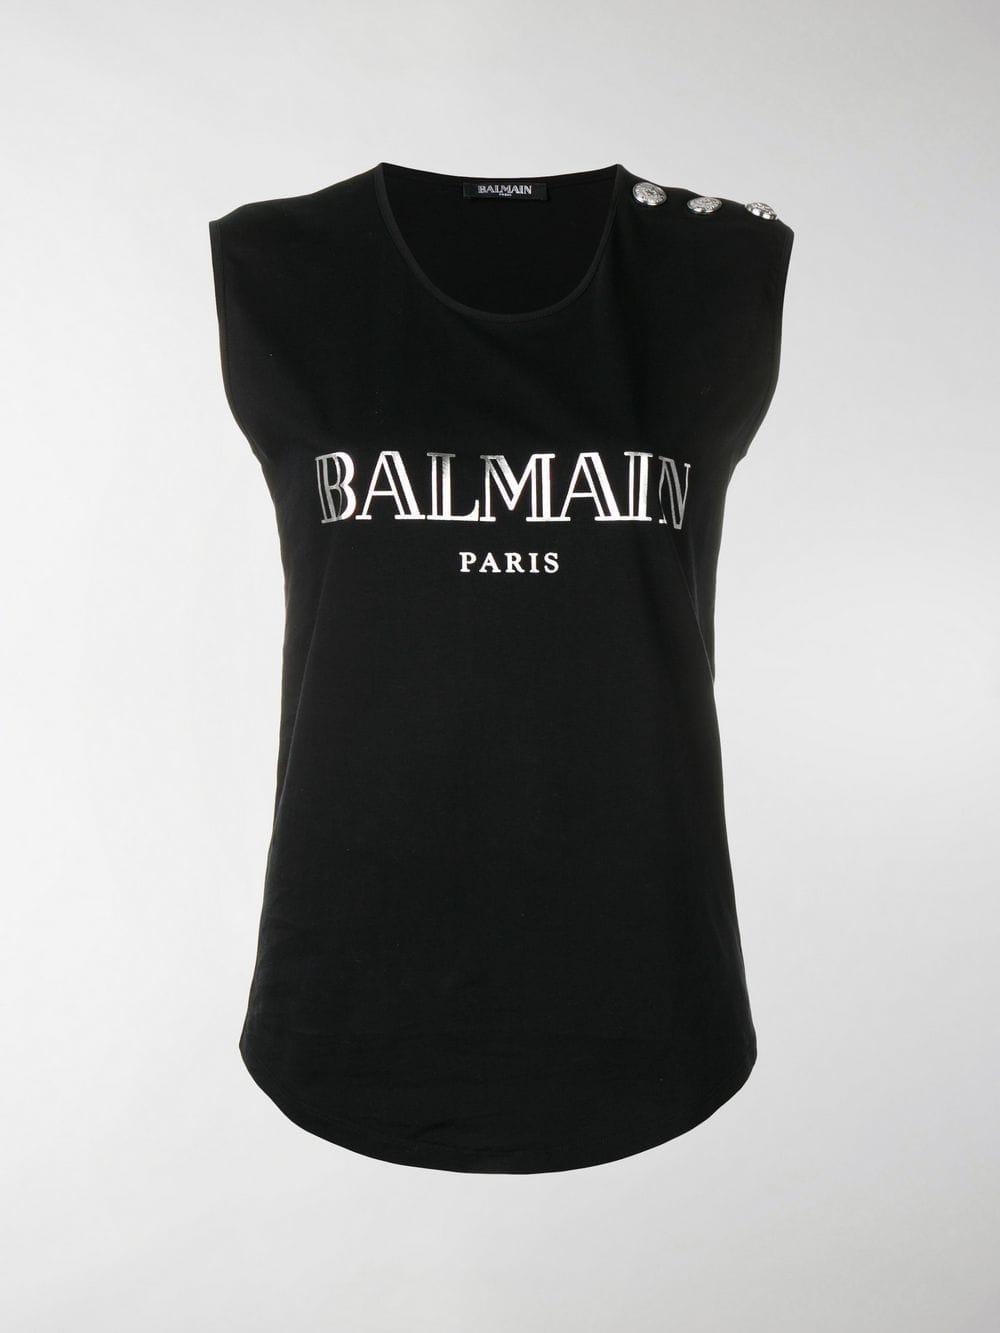 39d0f26ec1d00a Balmain - Black Logo Print Tank Top - Lyst. View fullscreen